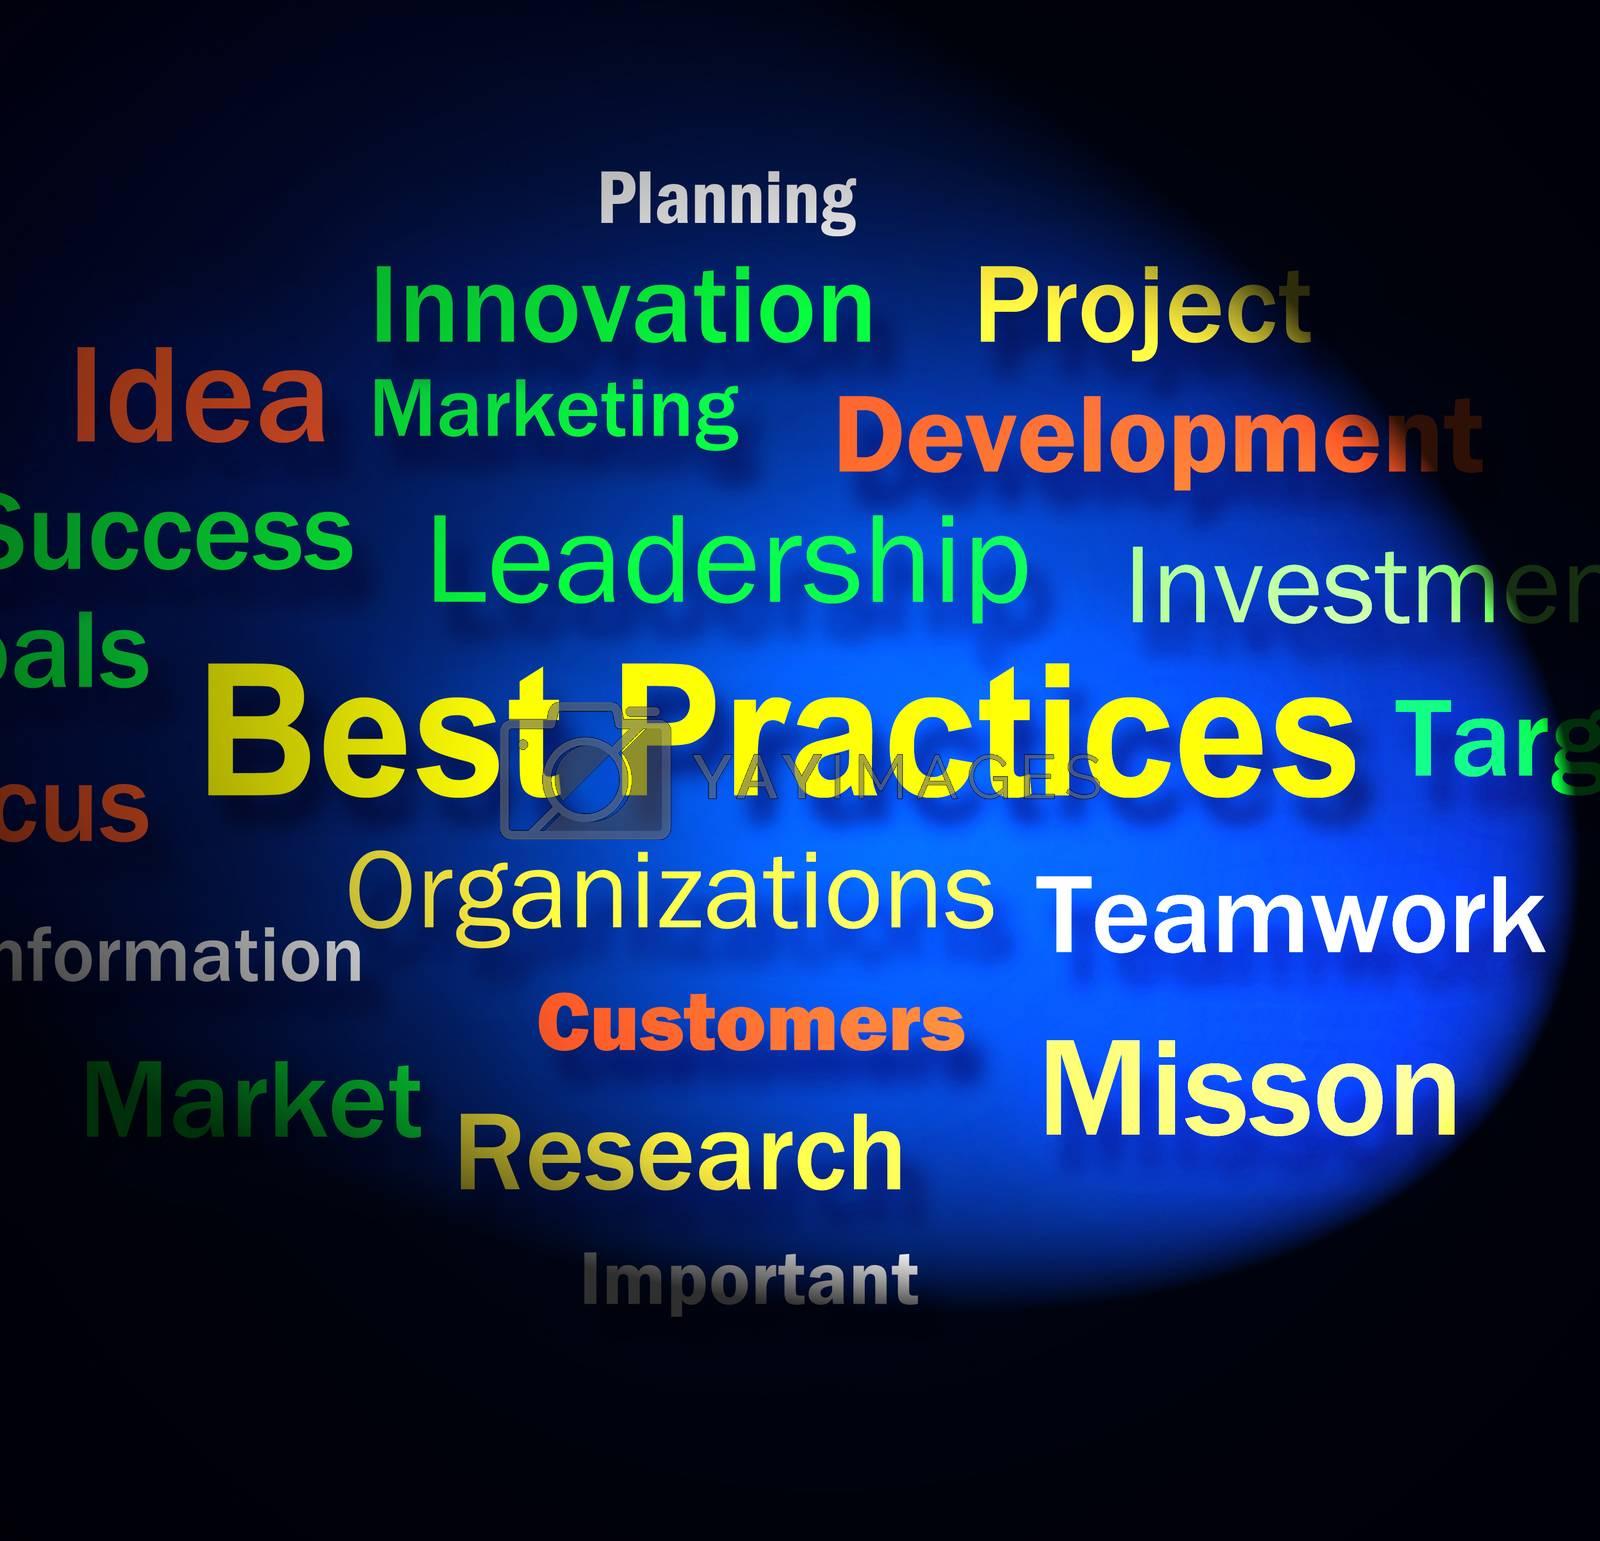 Best Practices Words Shows Optimum Business Procedures by stuartmiles